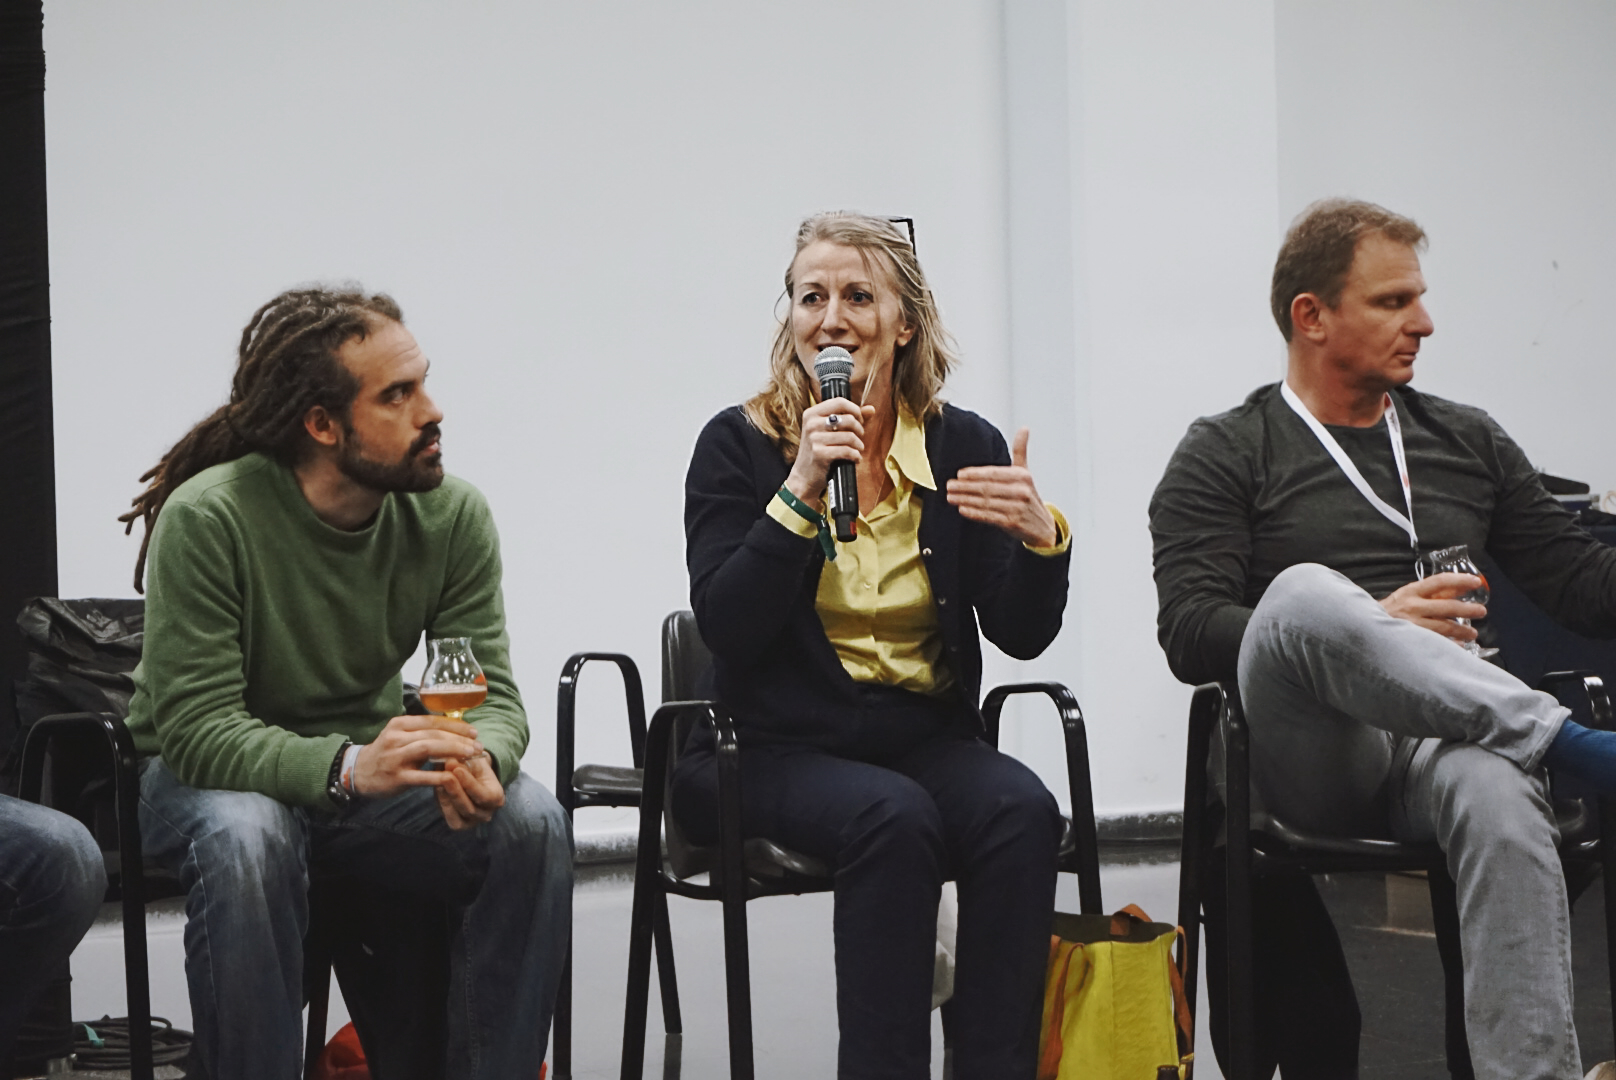 Intervención de Sylvia Kopp, embajadora de Brewers Association en Europa.